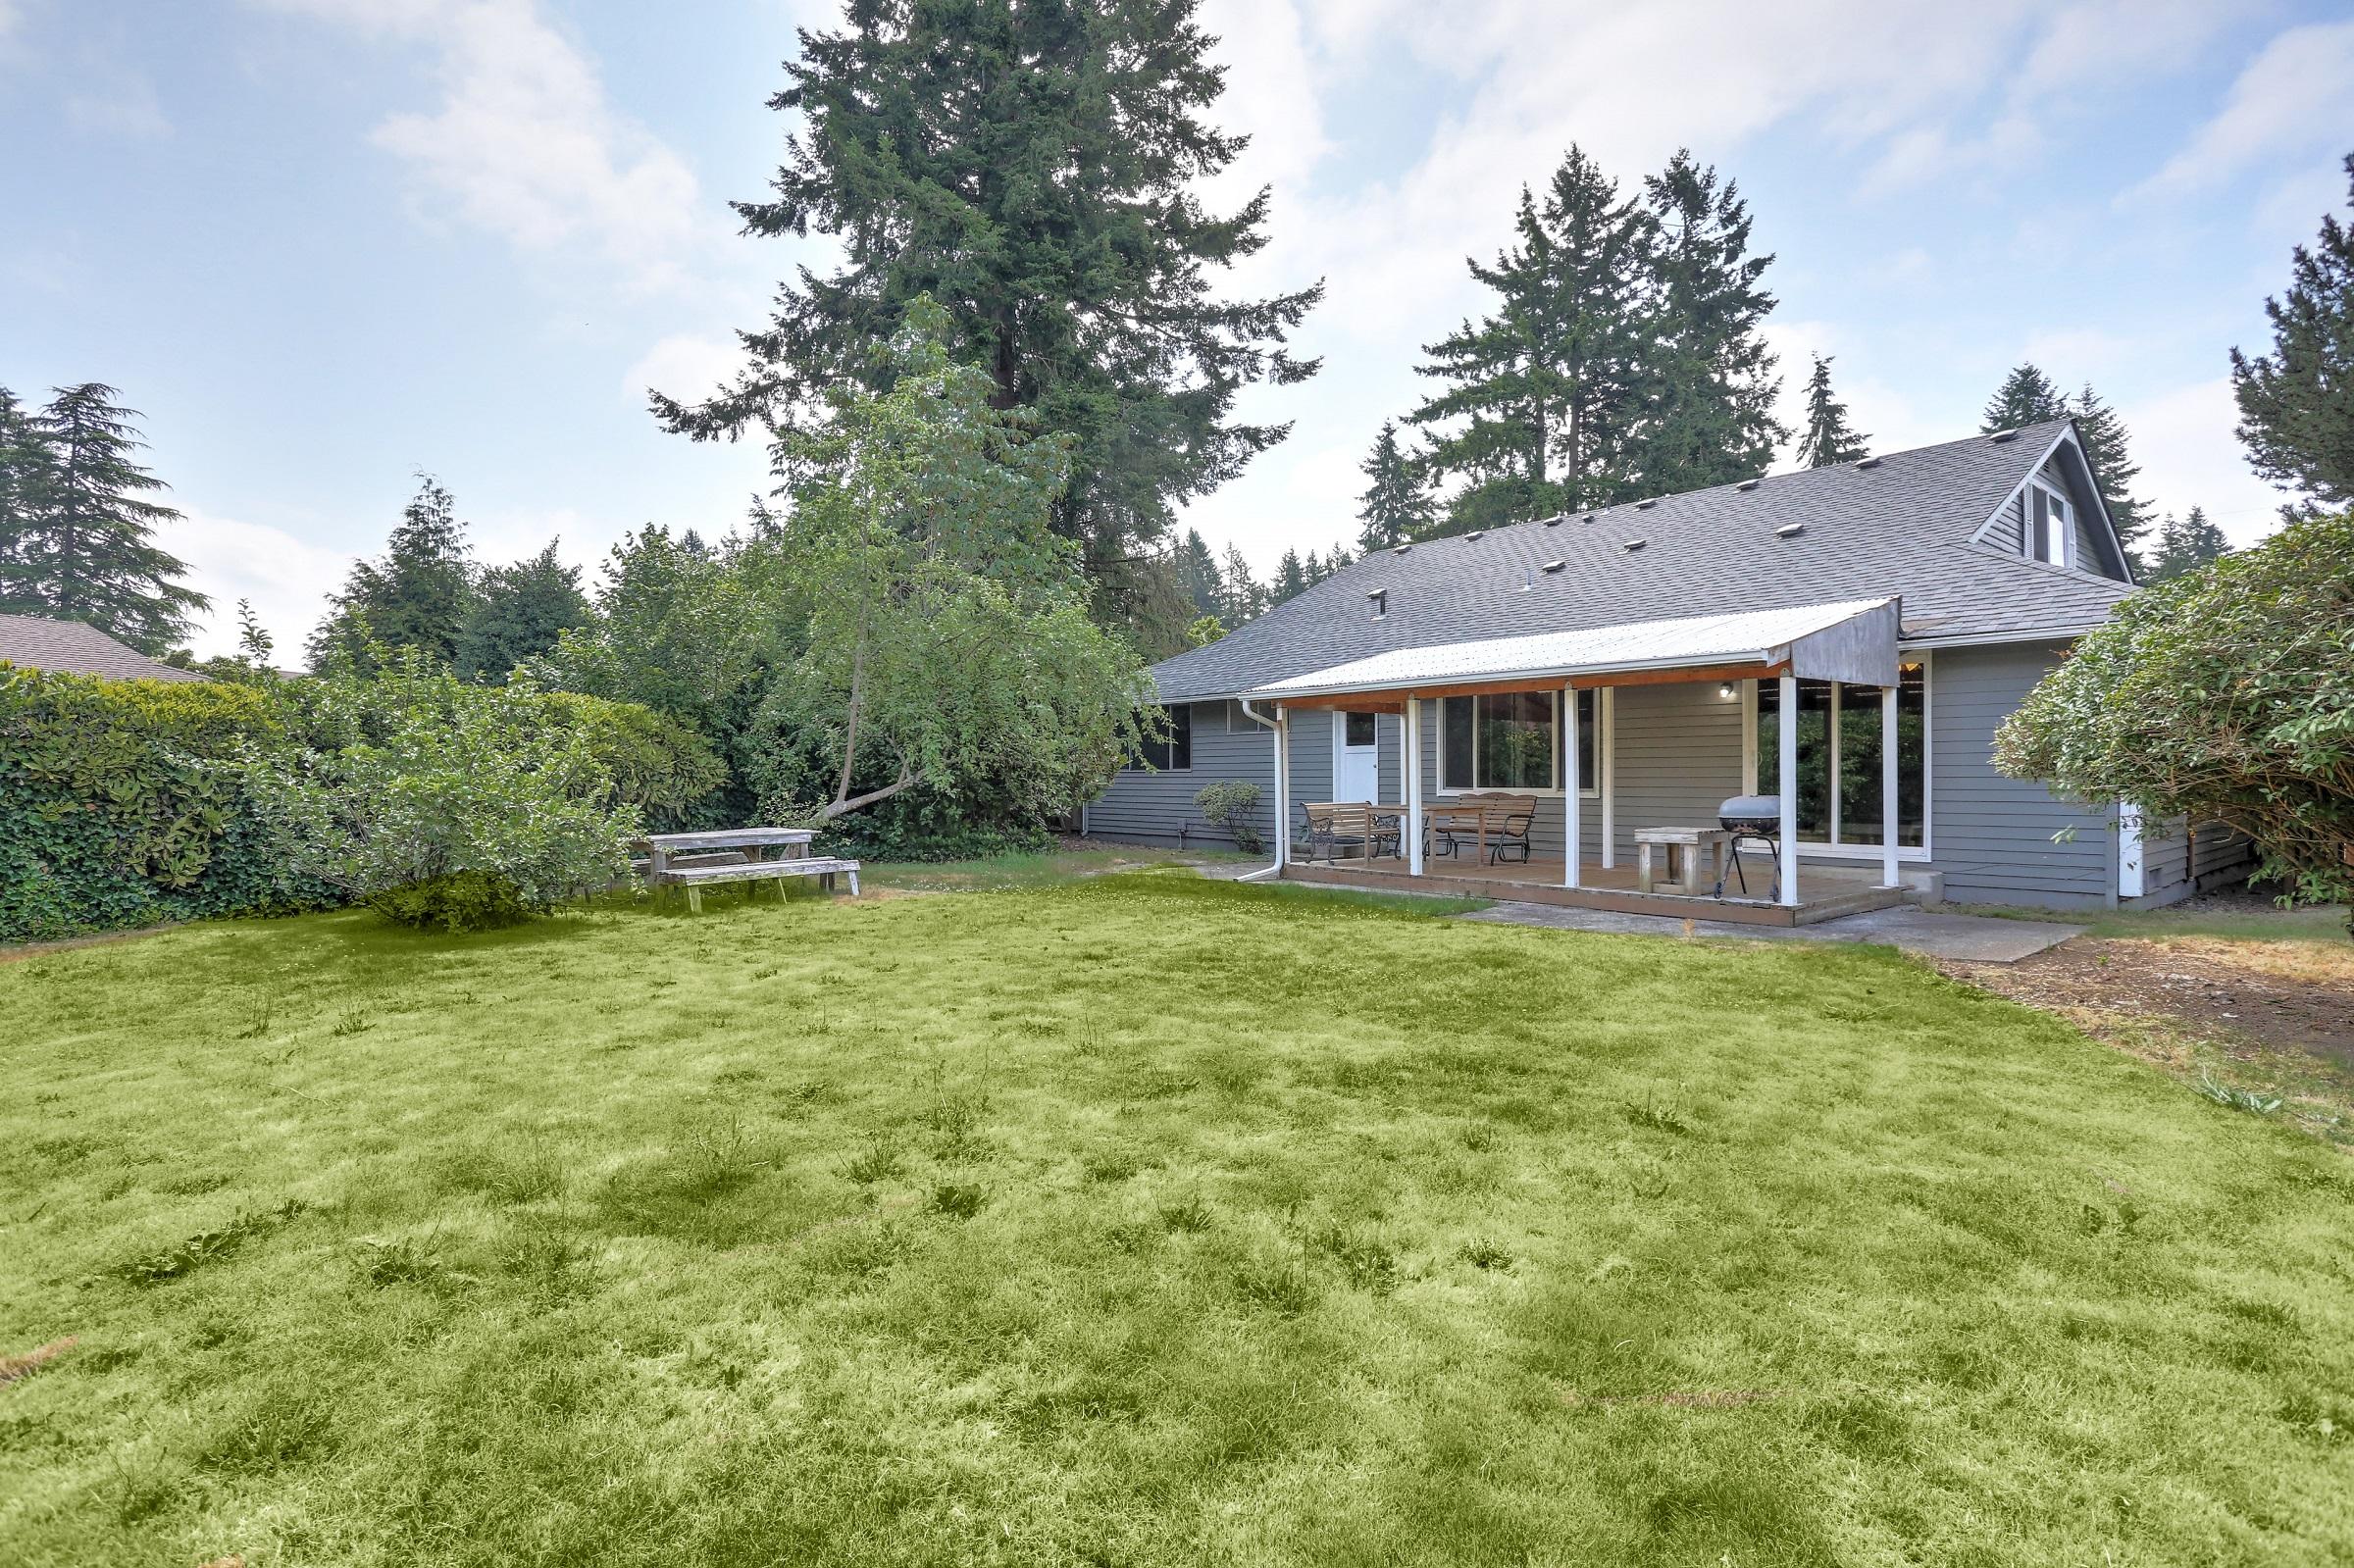 Backyard home for sale in Sumner